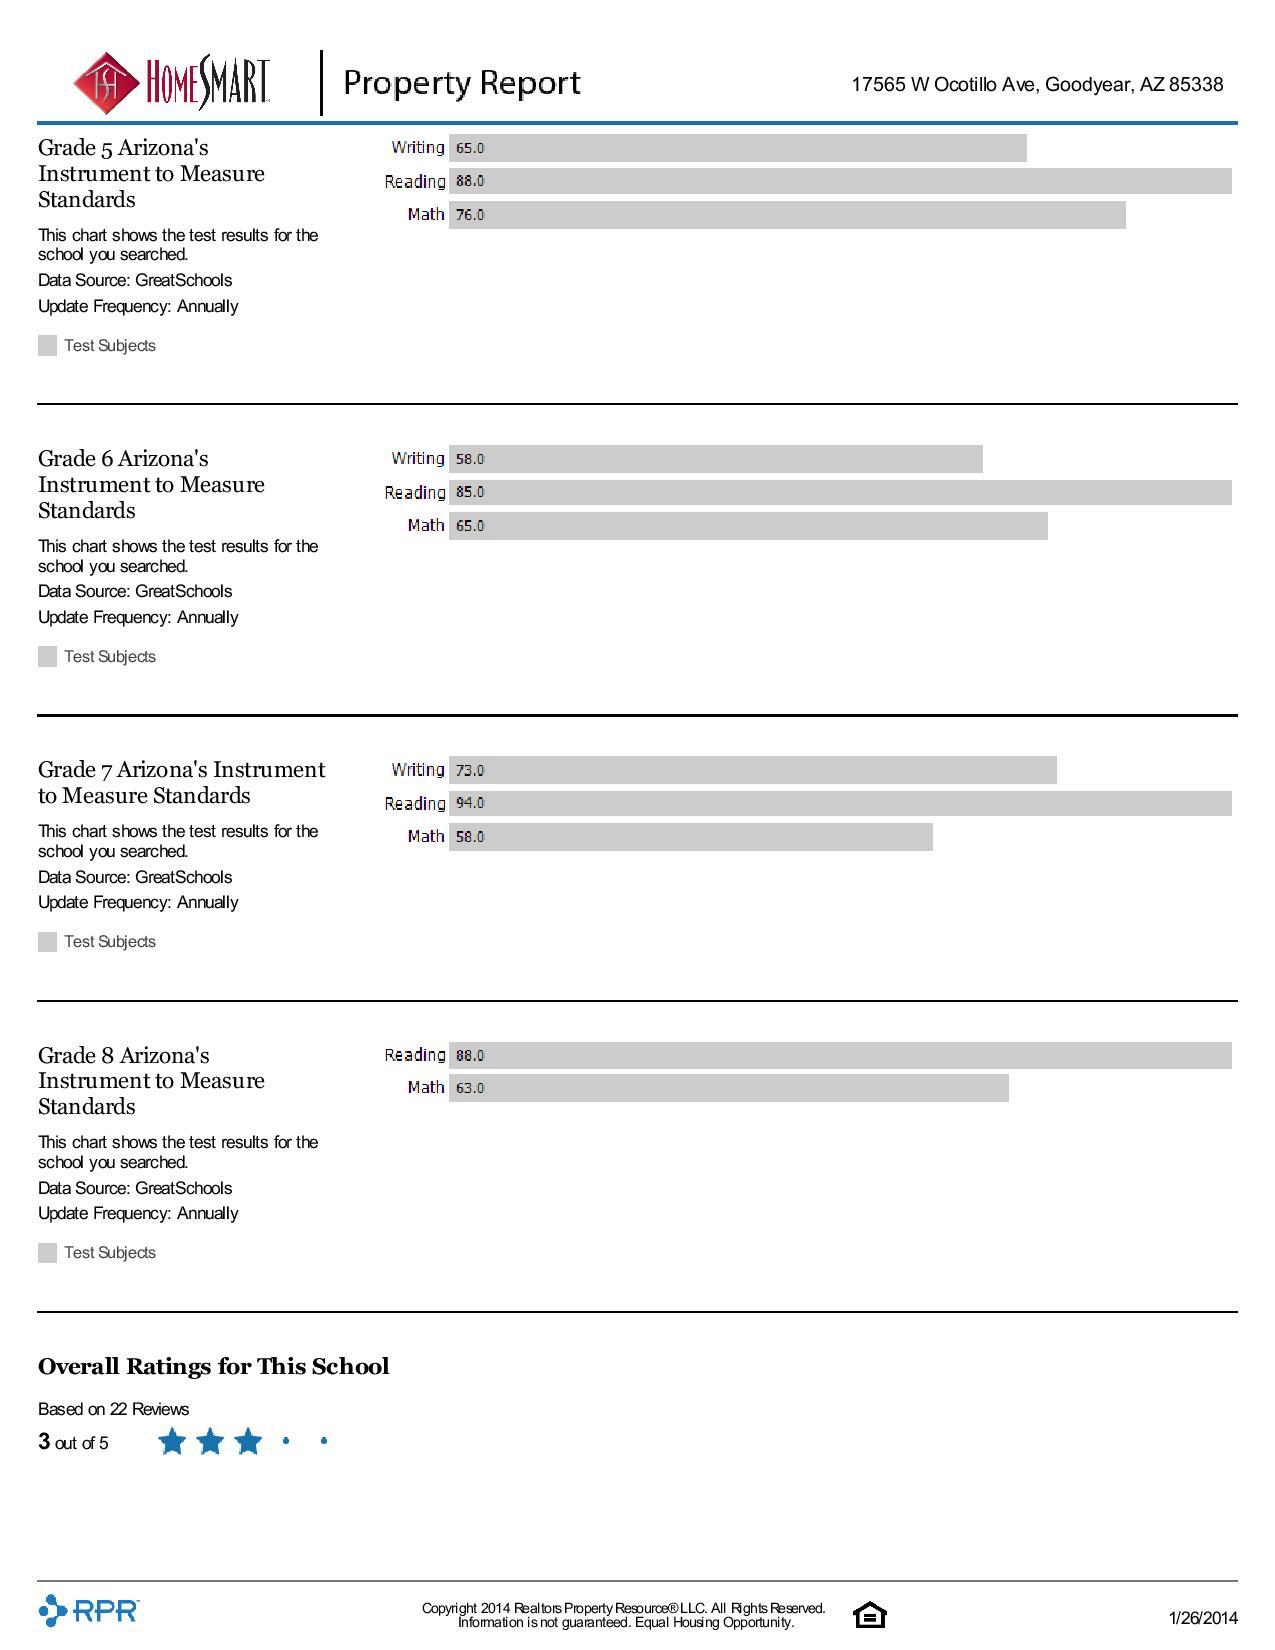 17565-W-Ocotillo-Ave-Goodyear-AZ-85338.pdf-page-015